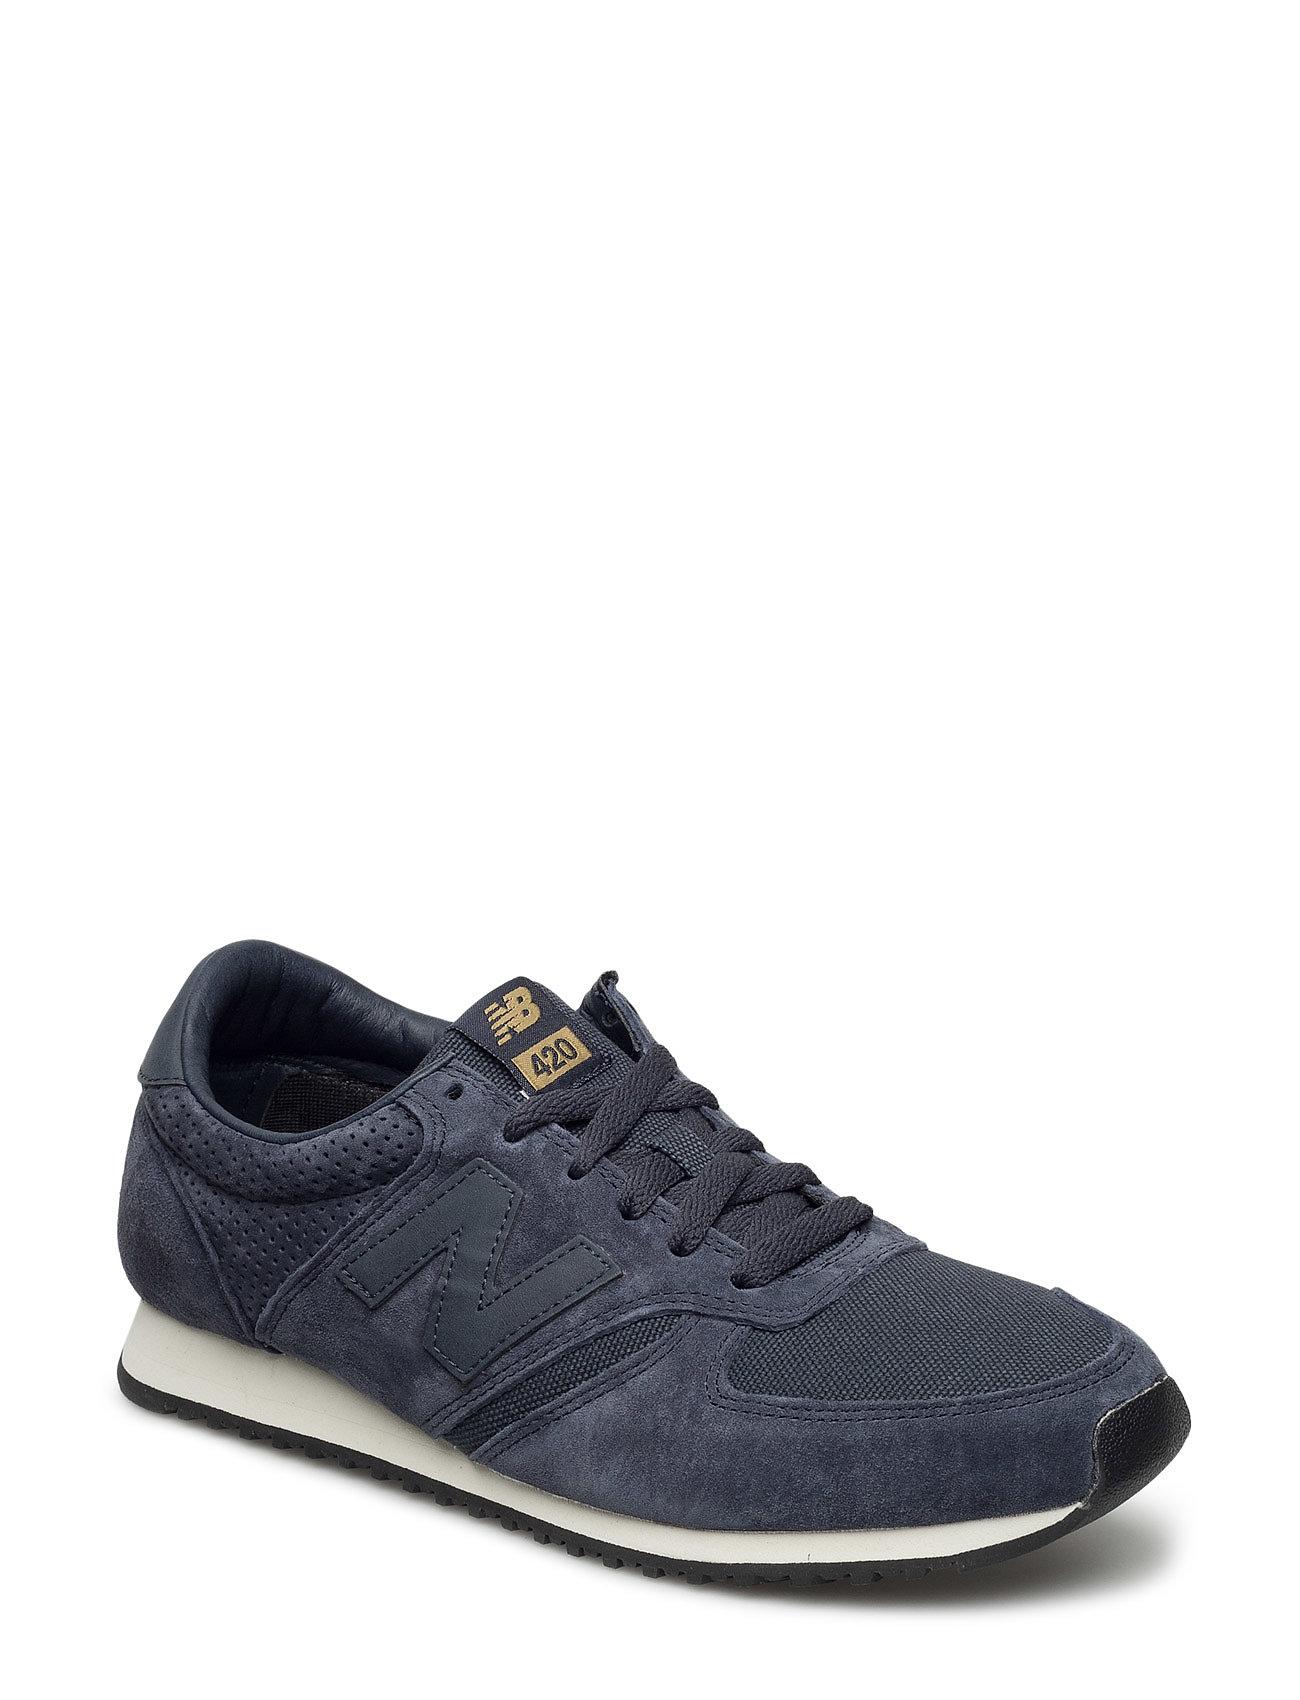 U420pnv New Balance Sneakers til Herrer i Navy blå